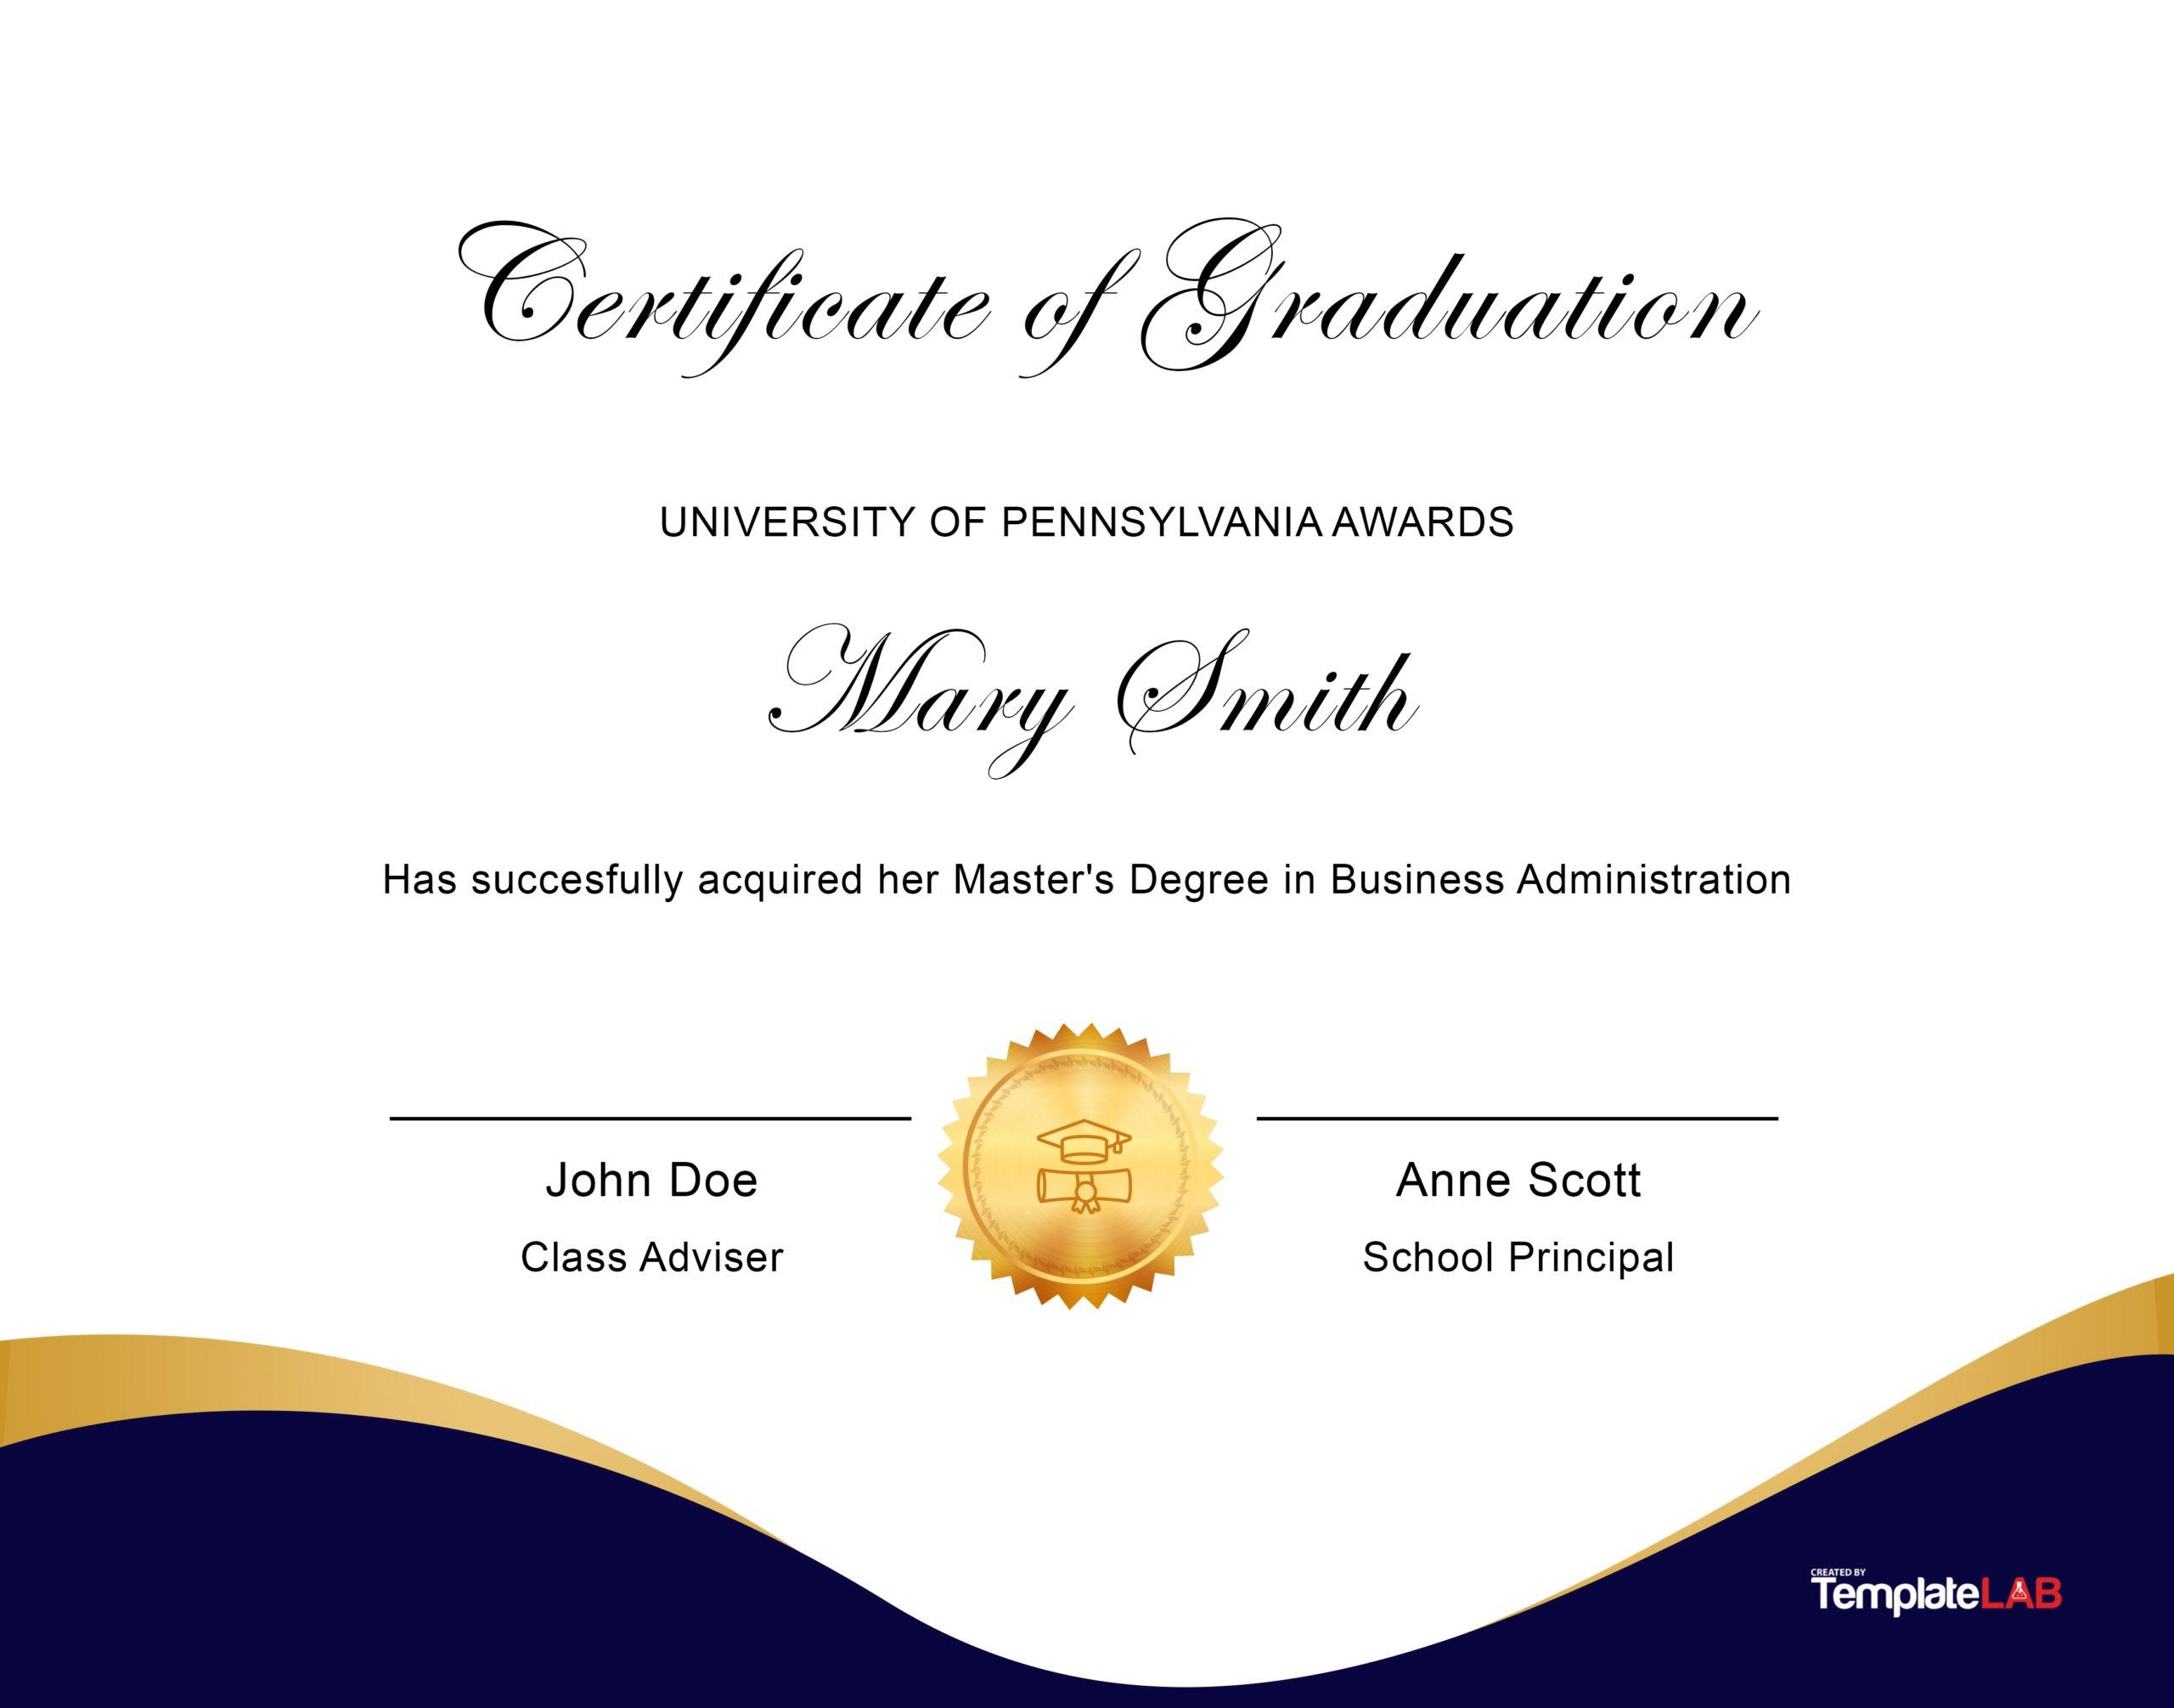 Free Diploma Template 11 - TemplateLab.com